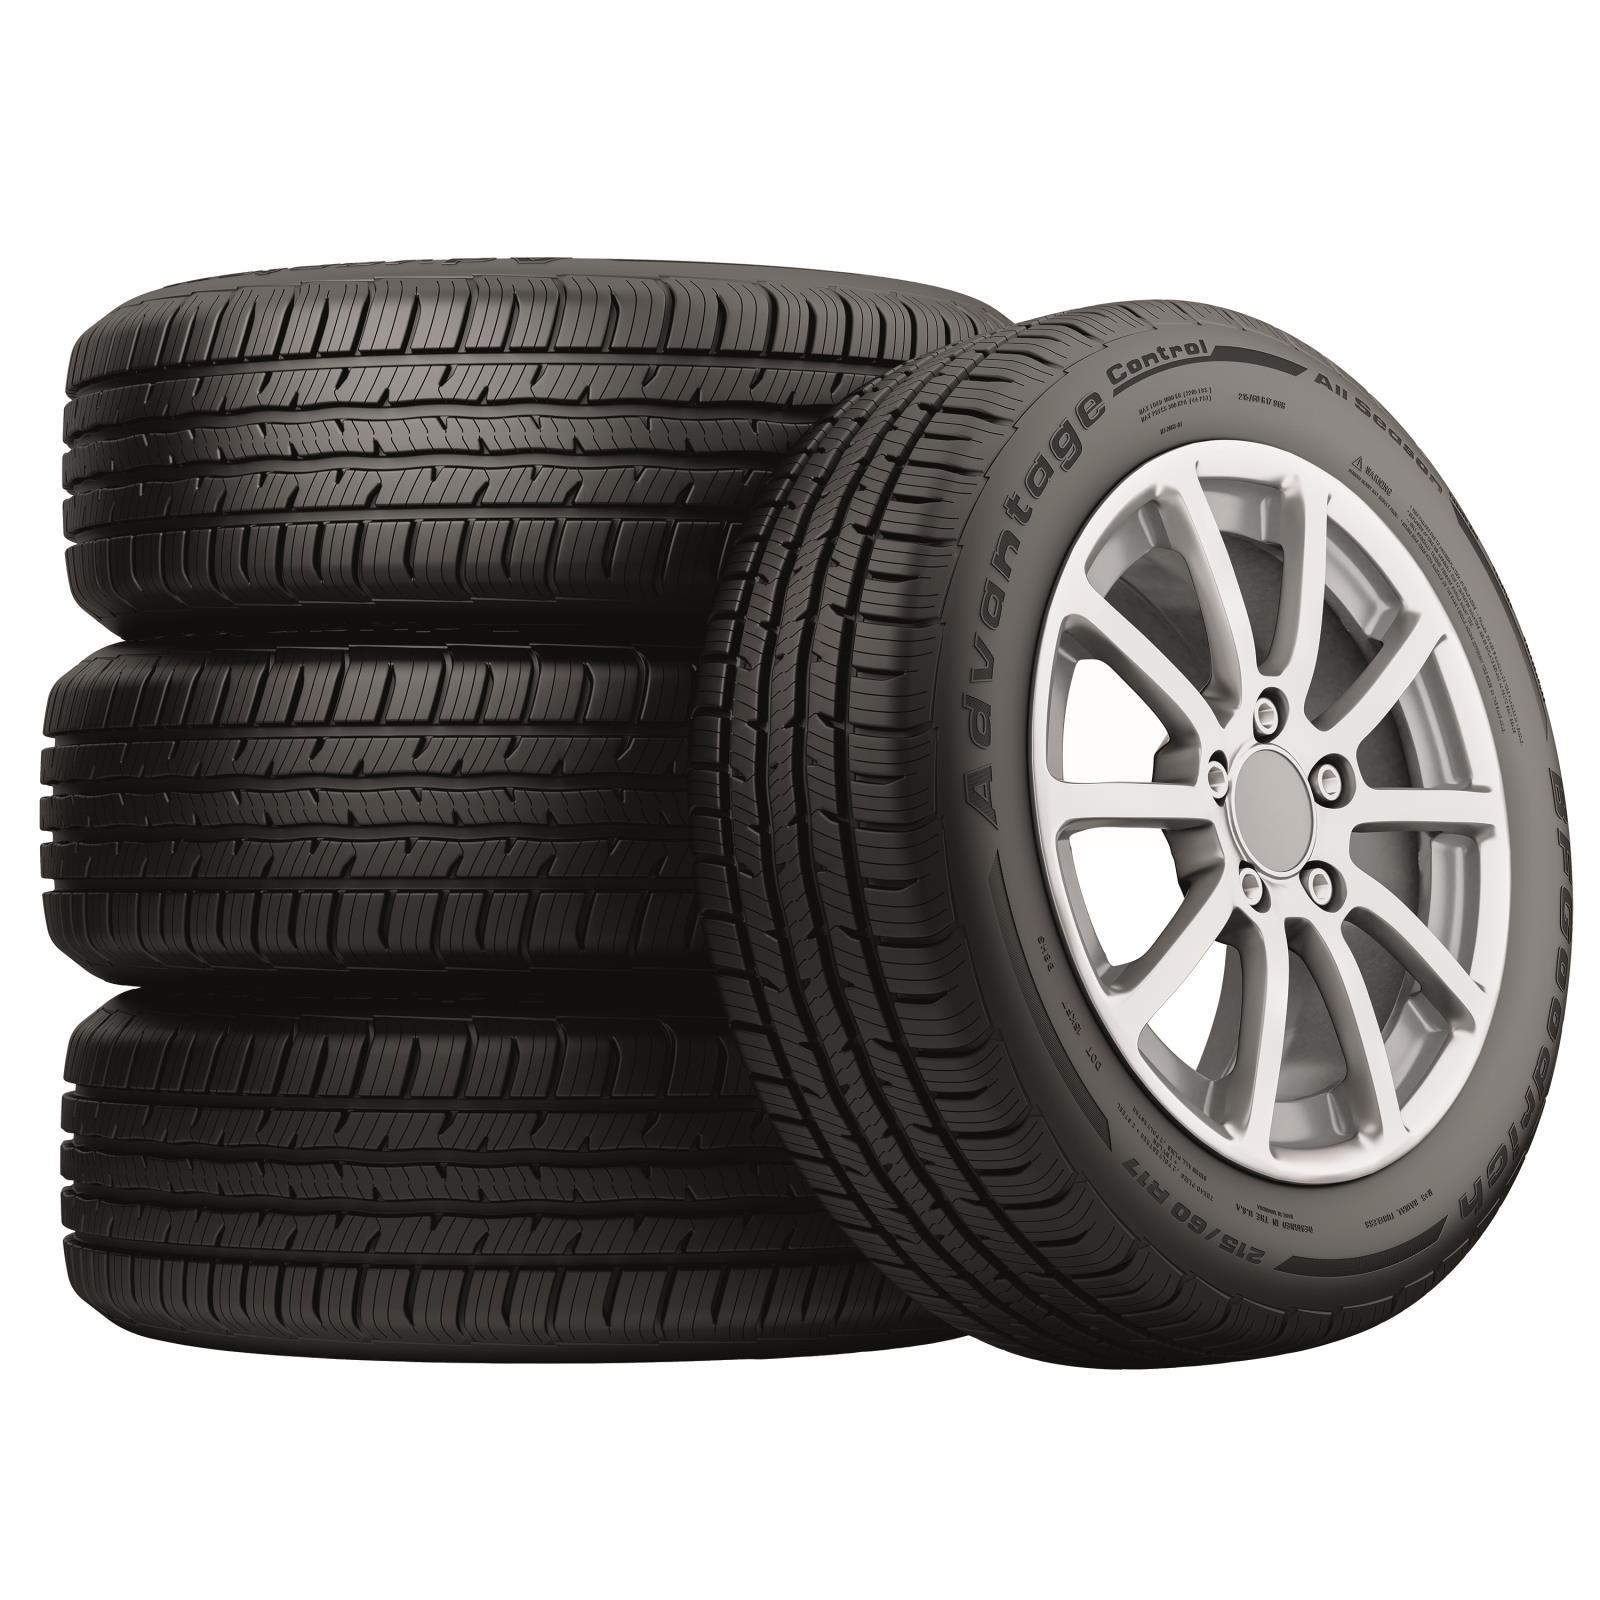 Stack of BFGoodrich Advantage Control all-season tires